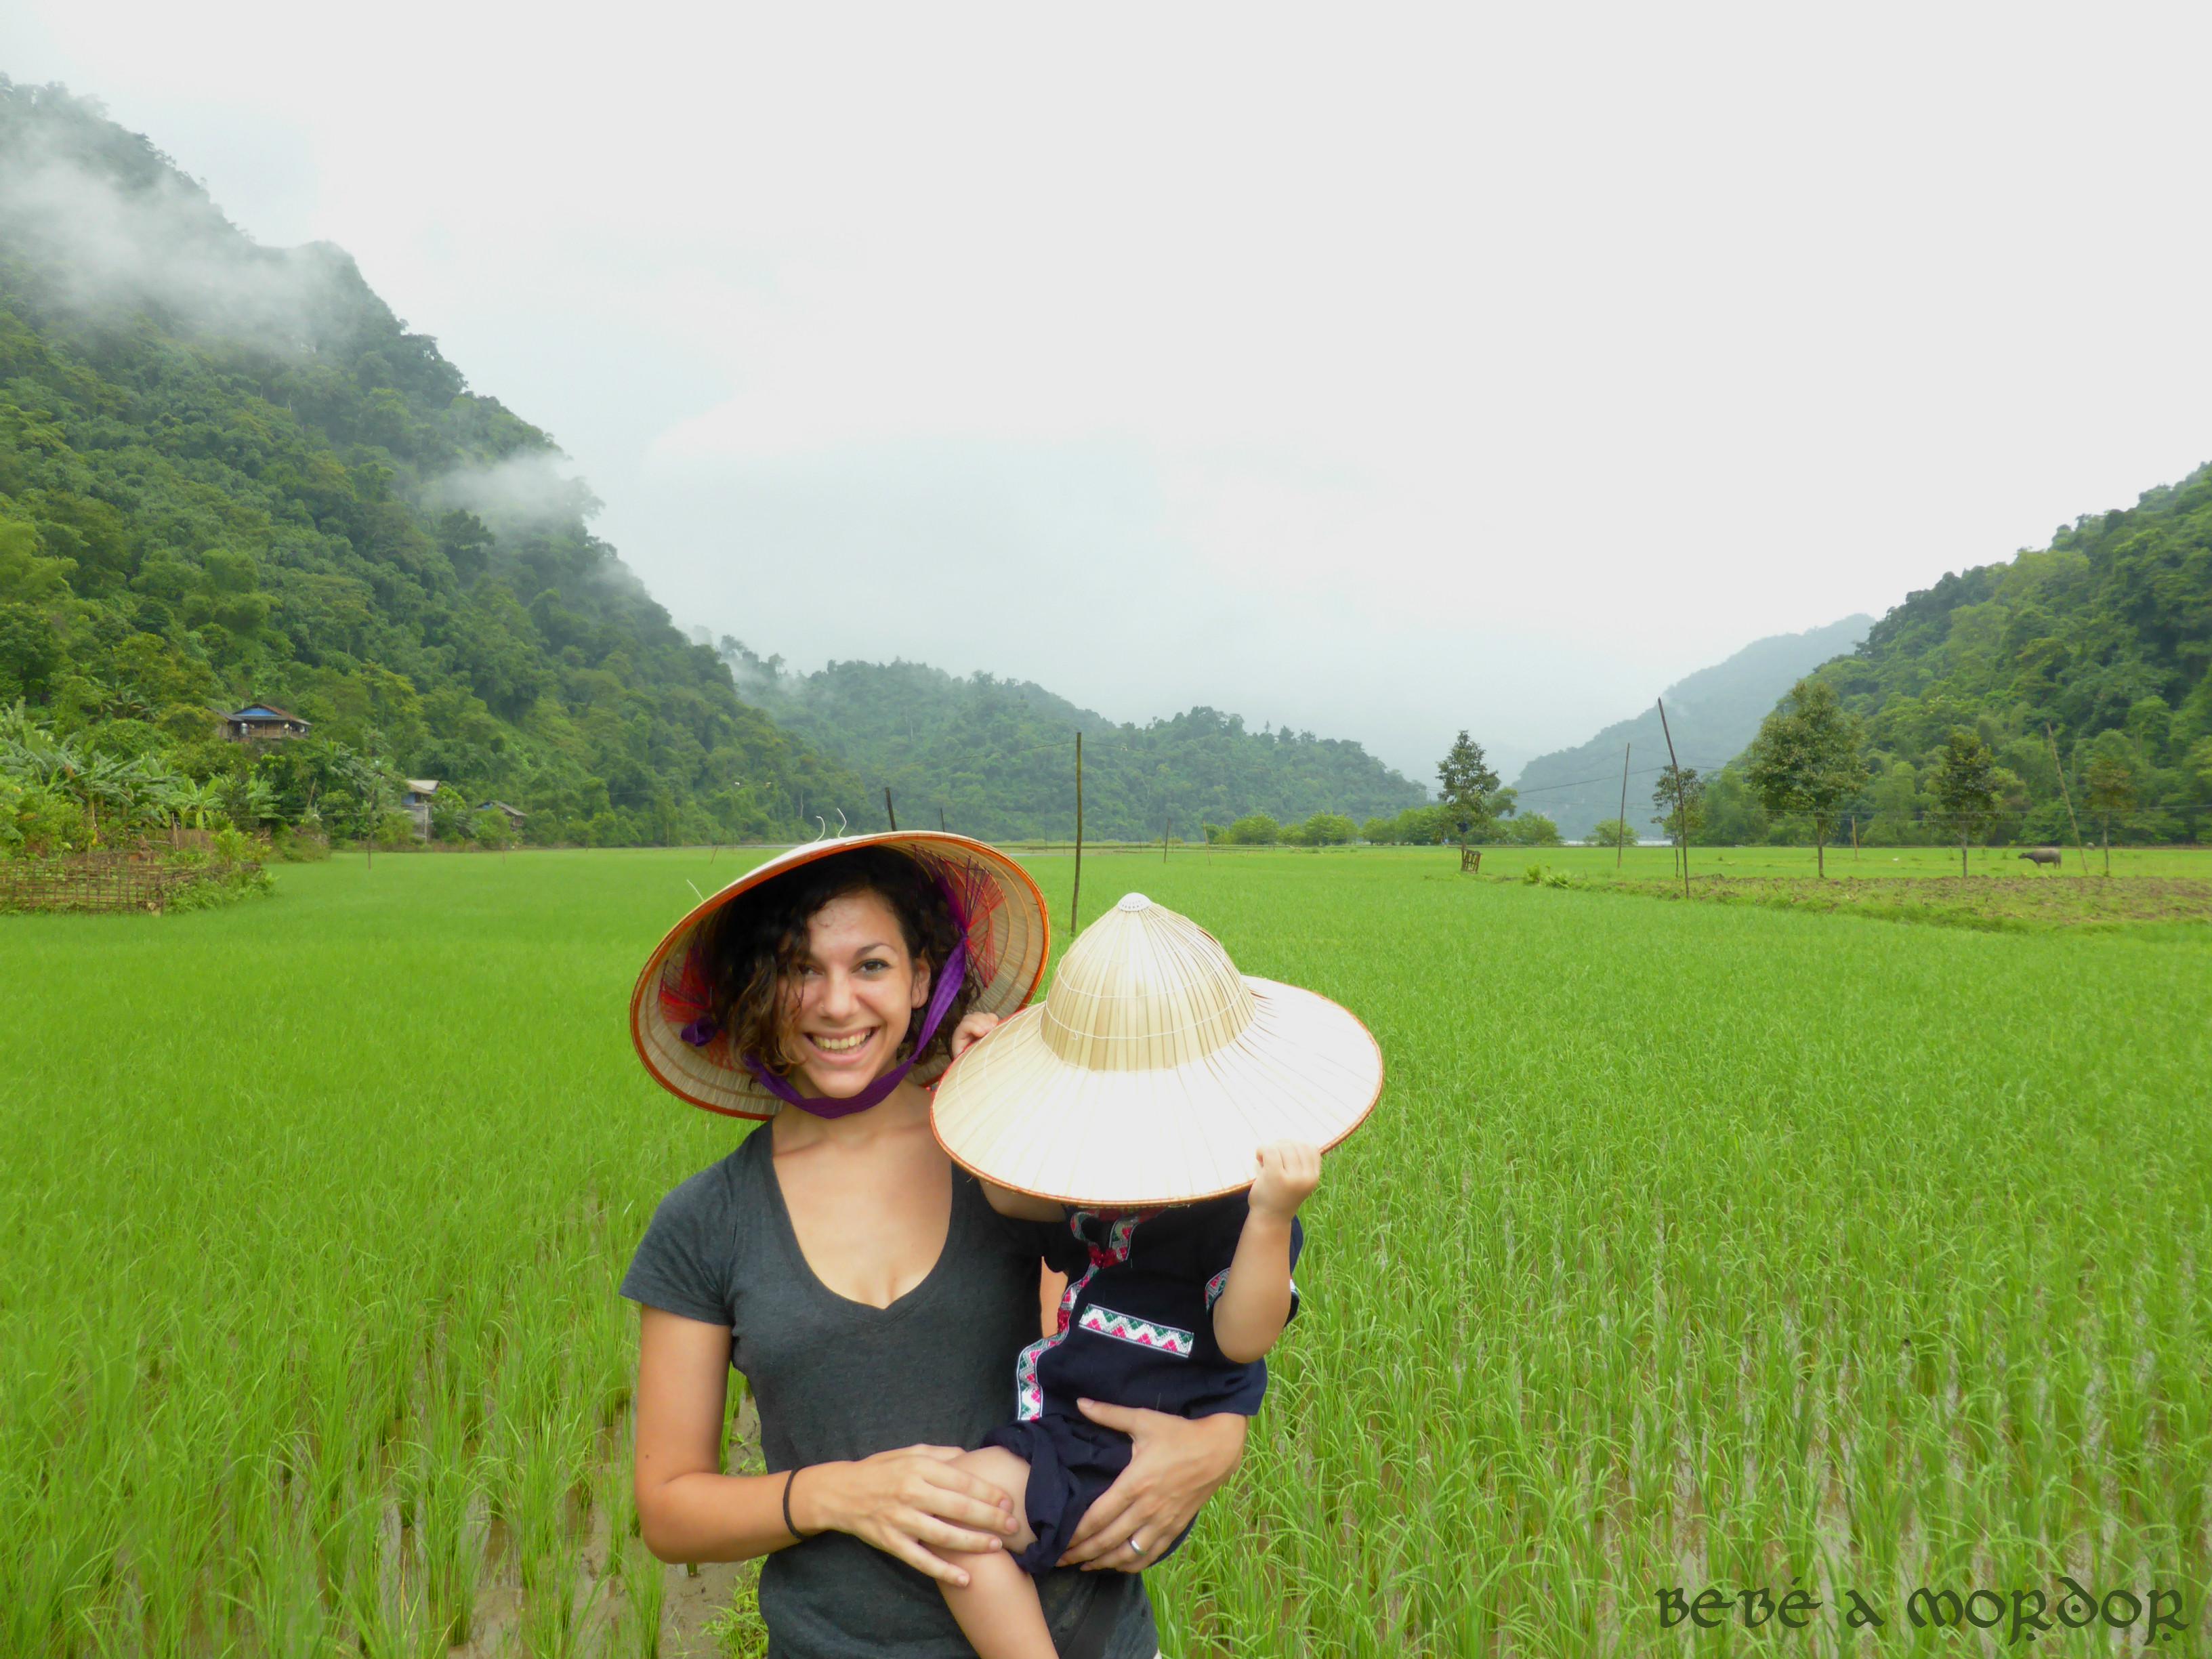 vietnam-bebe-arrozal-sombrero